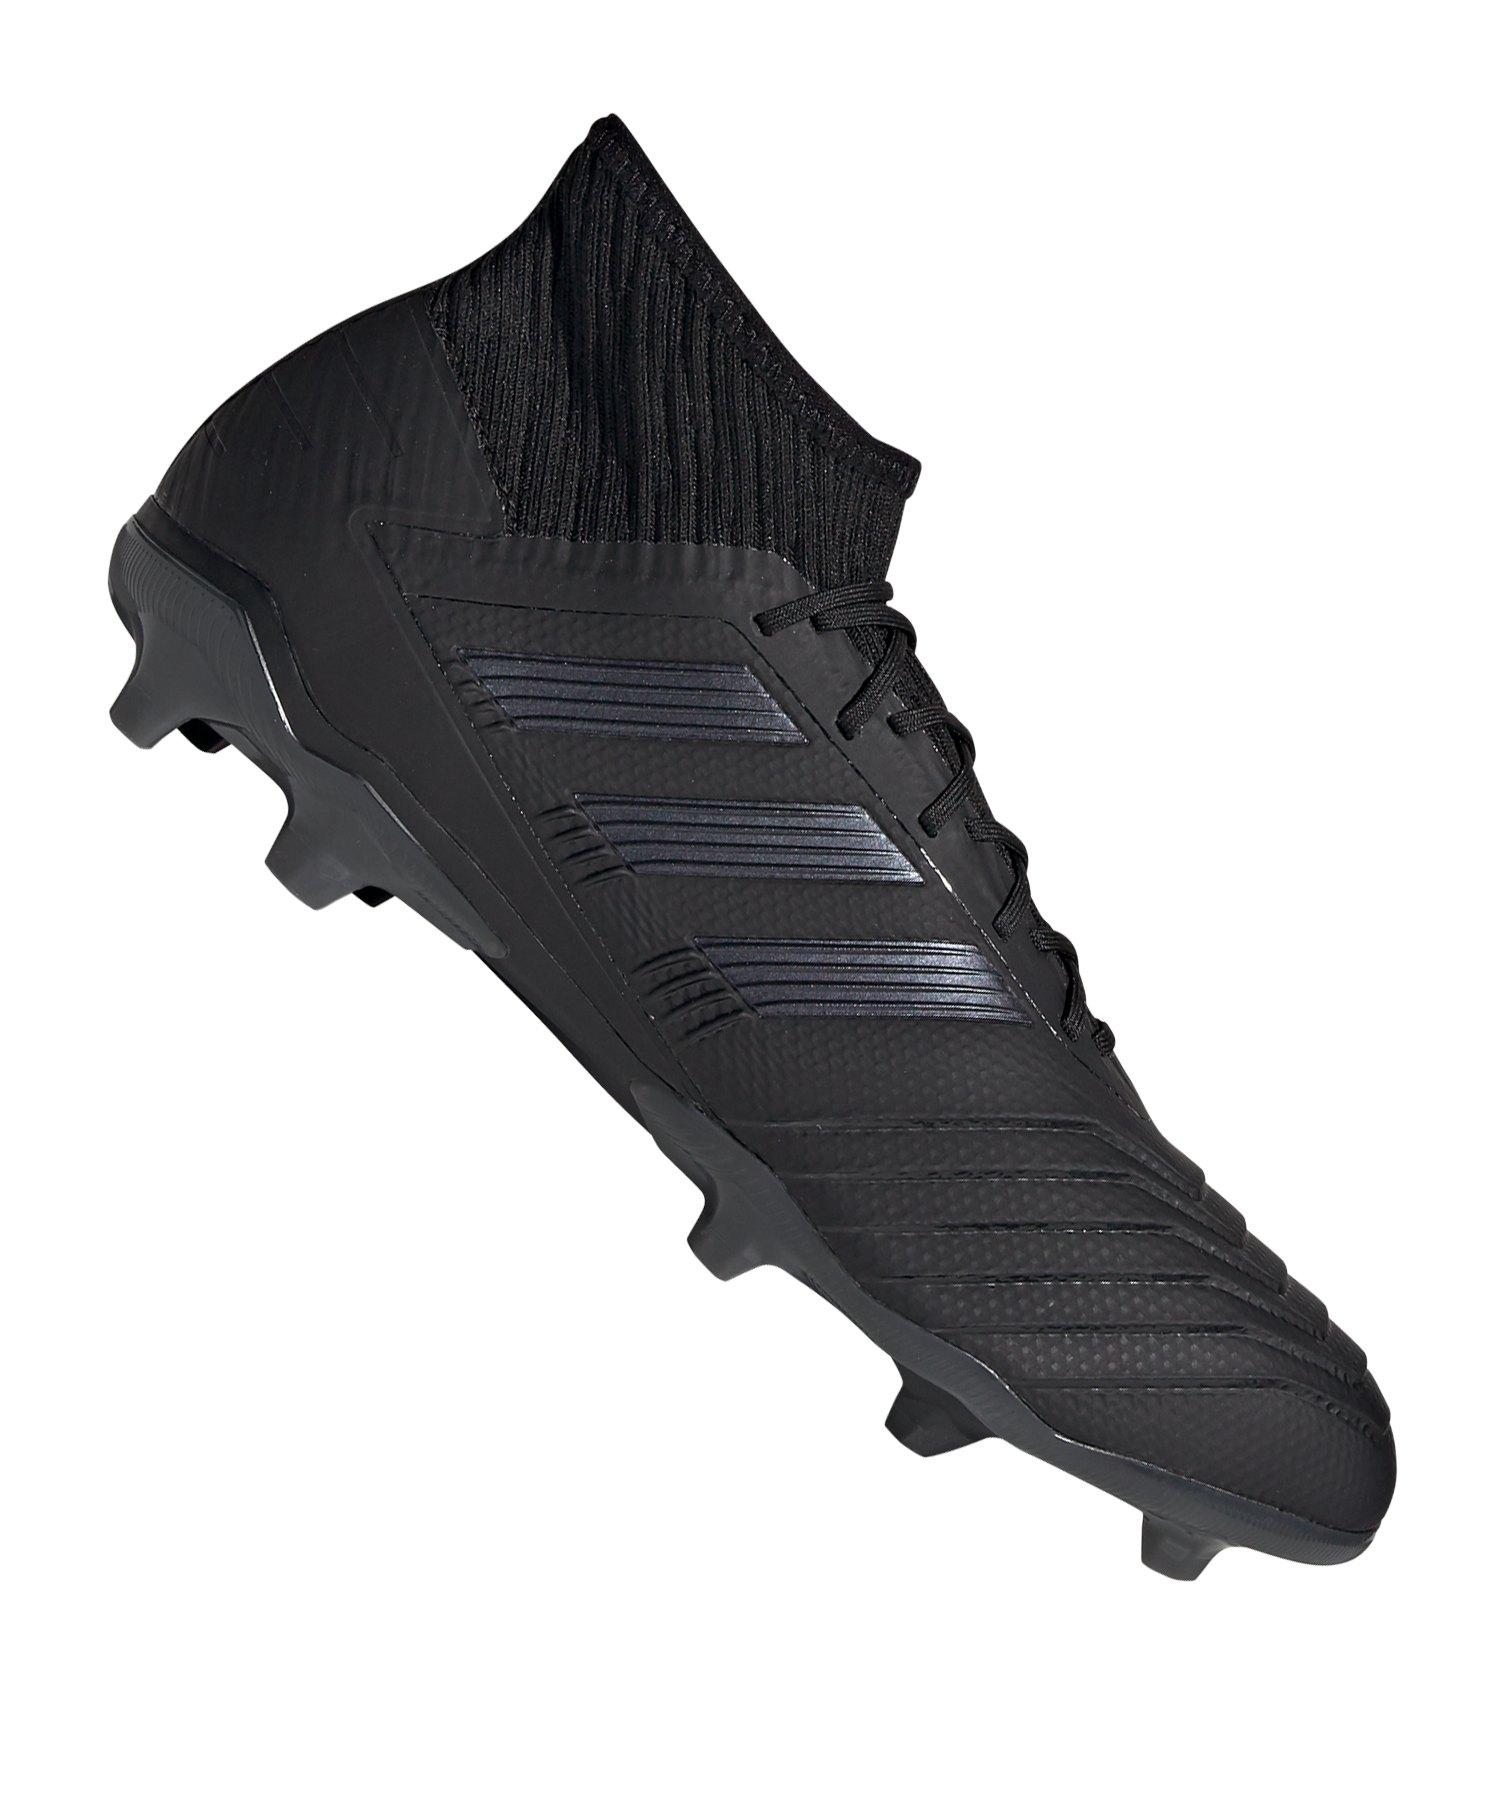 adidas Predator 19.2 FG Schwarz - schwarz